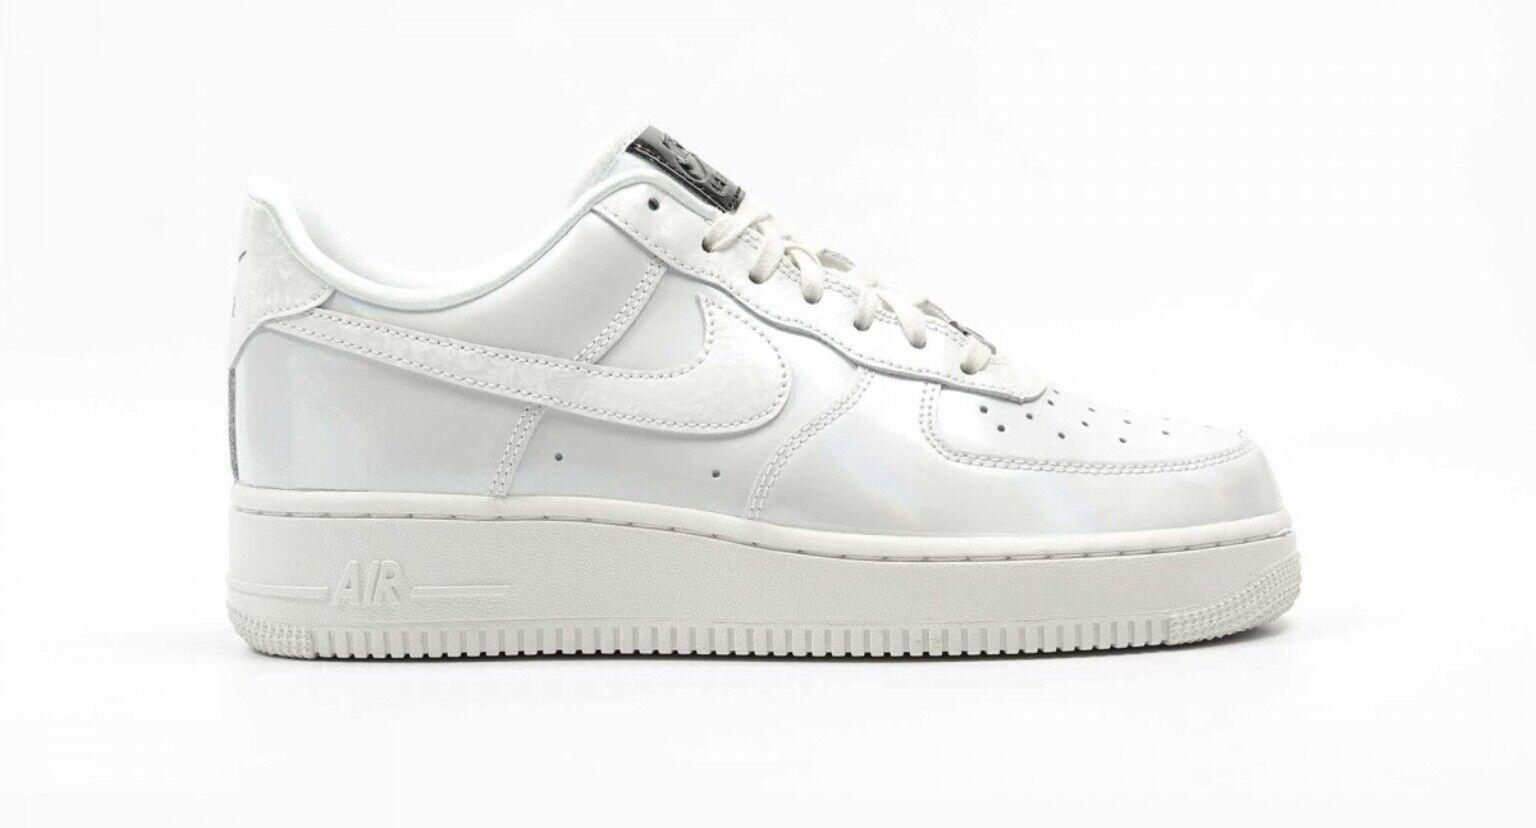 Nike Air Force 1 07 LX White Womens | 898889 100